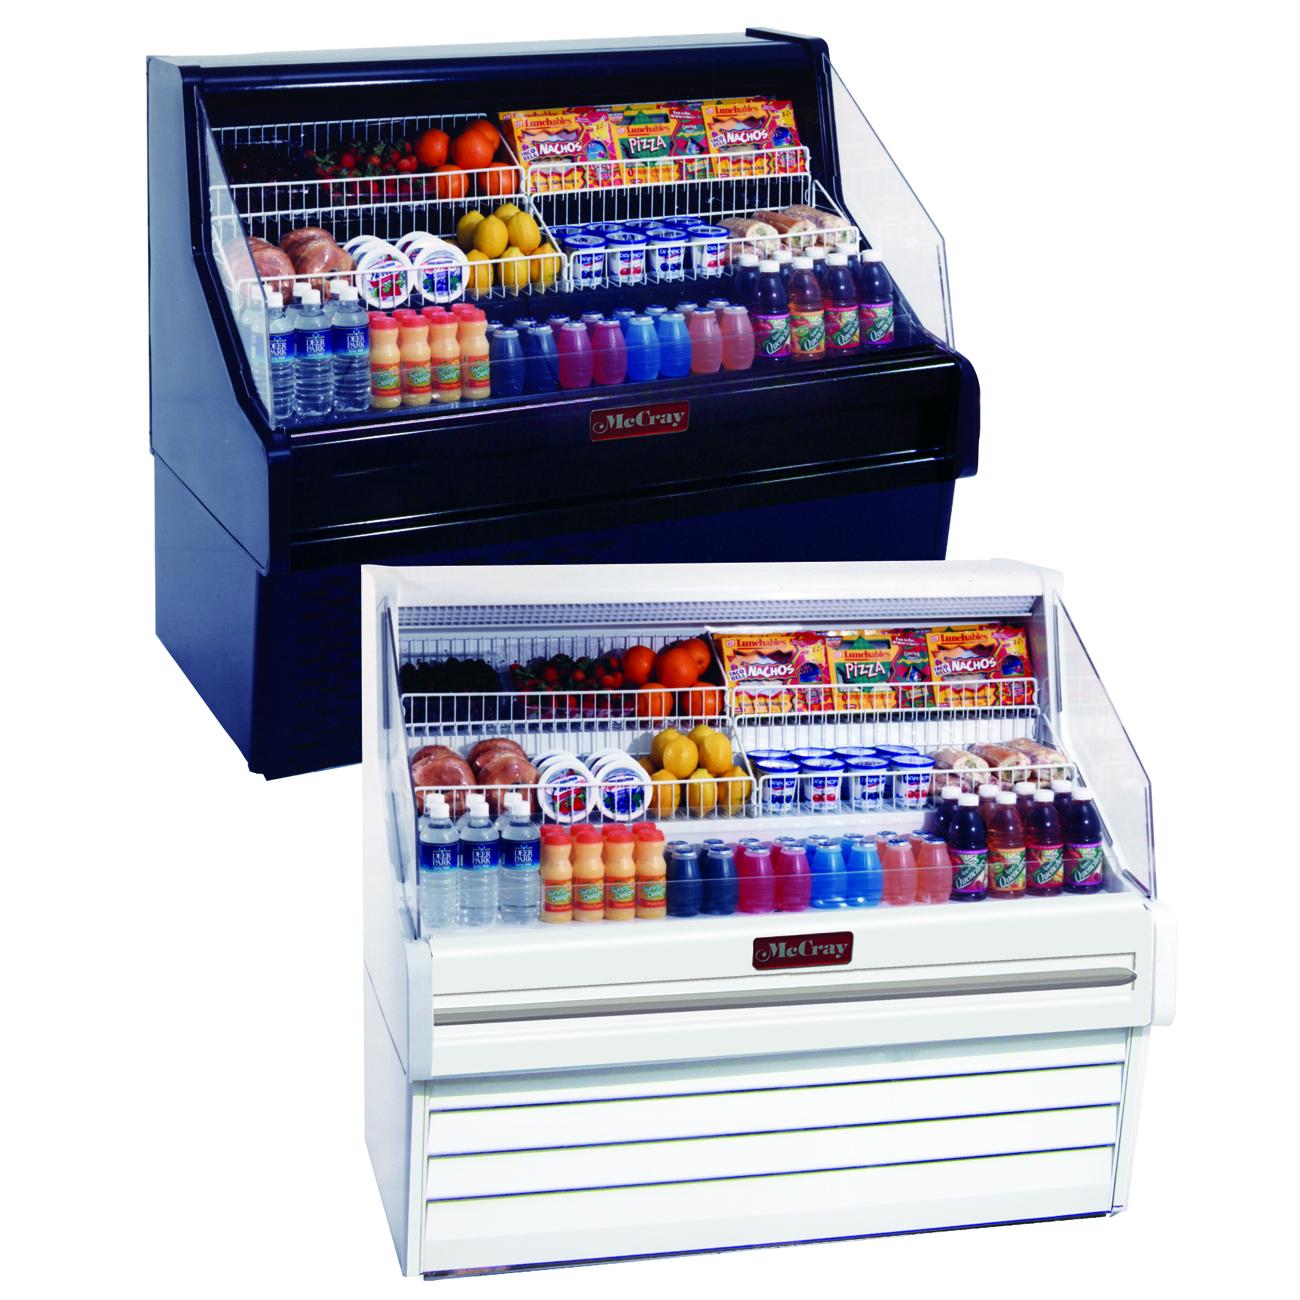 Howard-McCray SC-OS30E-5 merchandiser, open refrigerated display